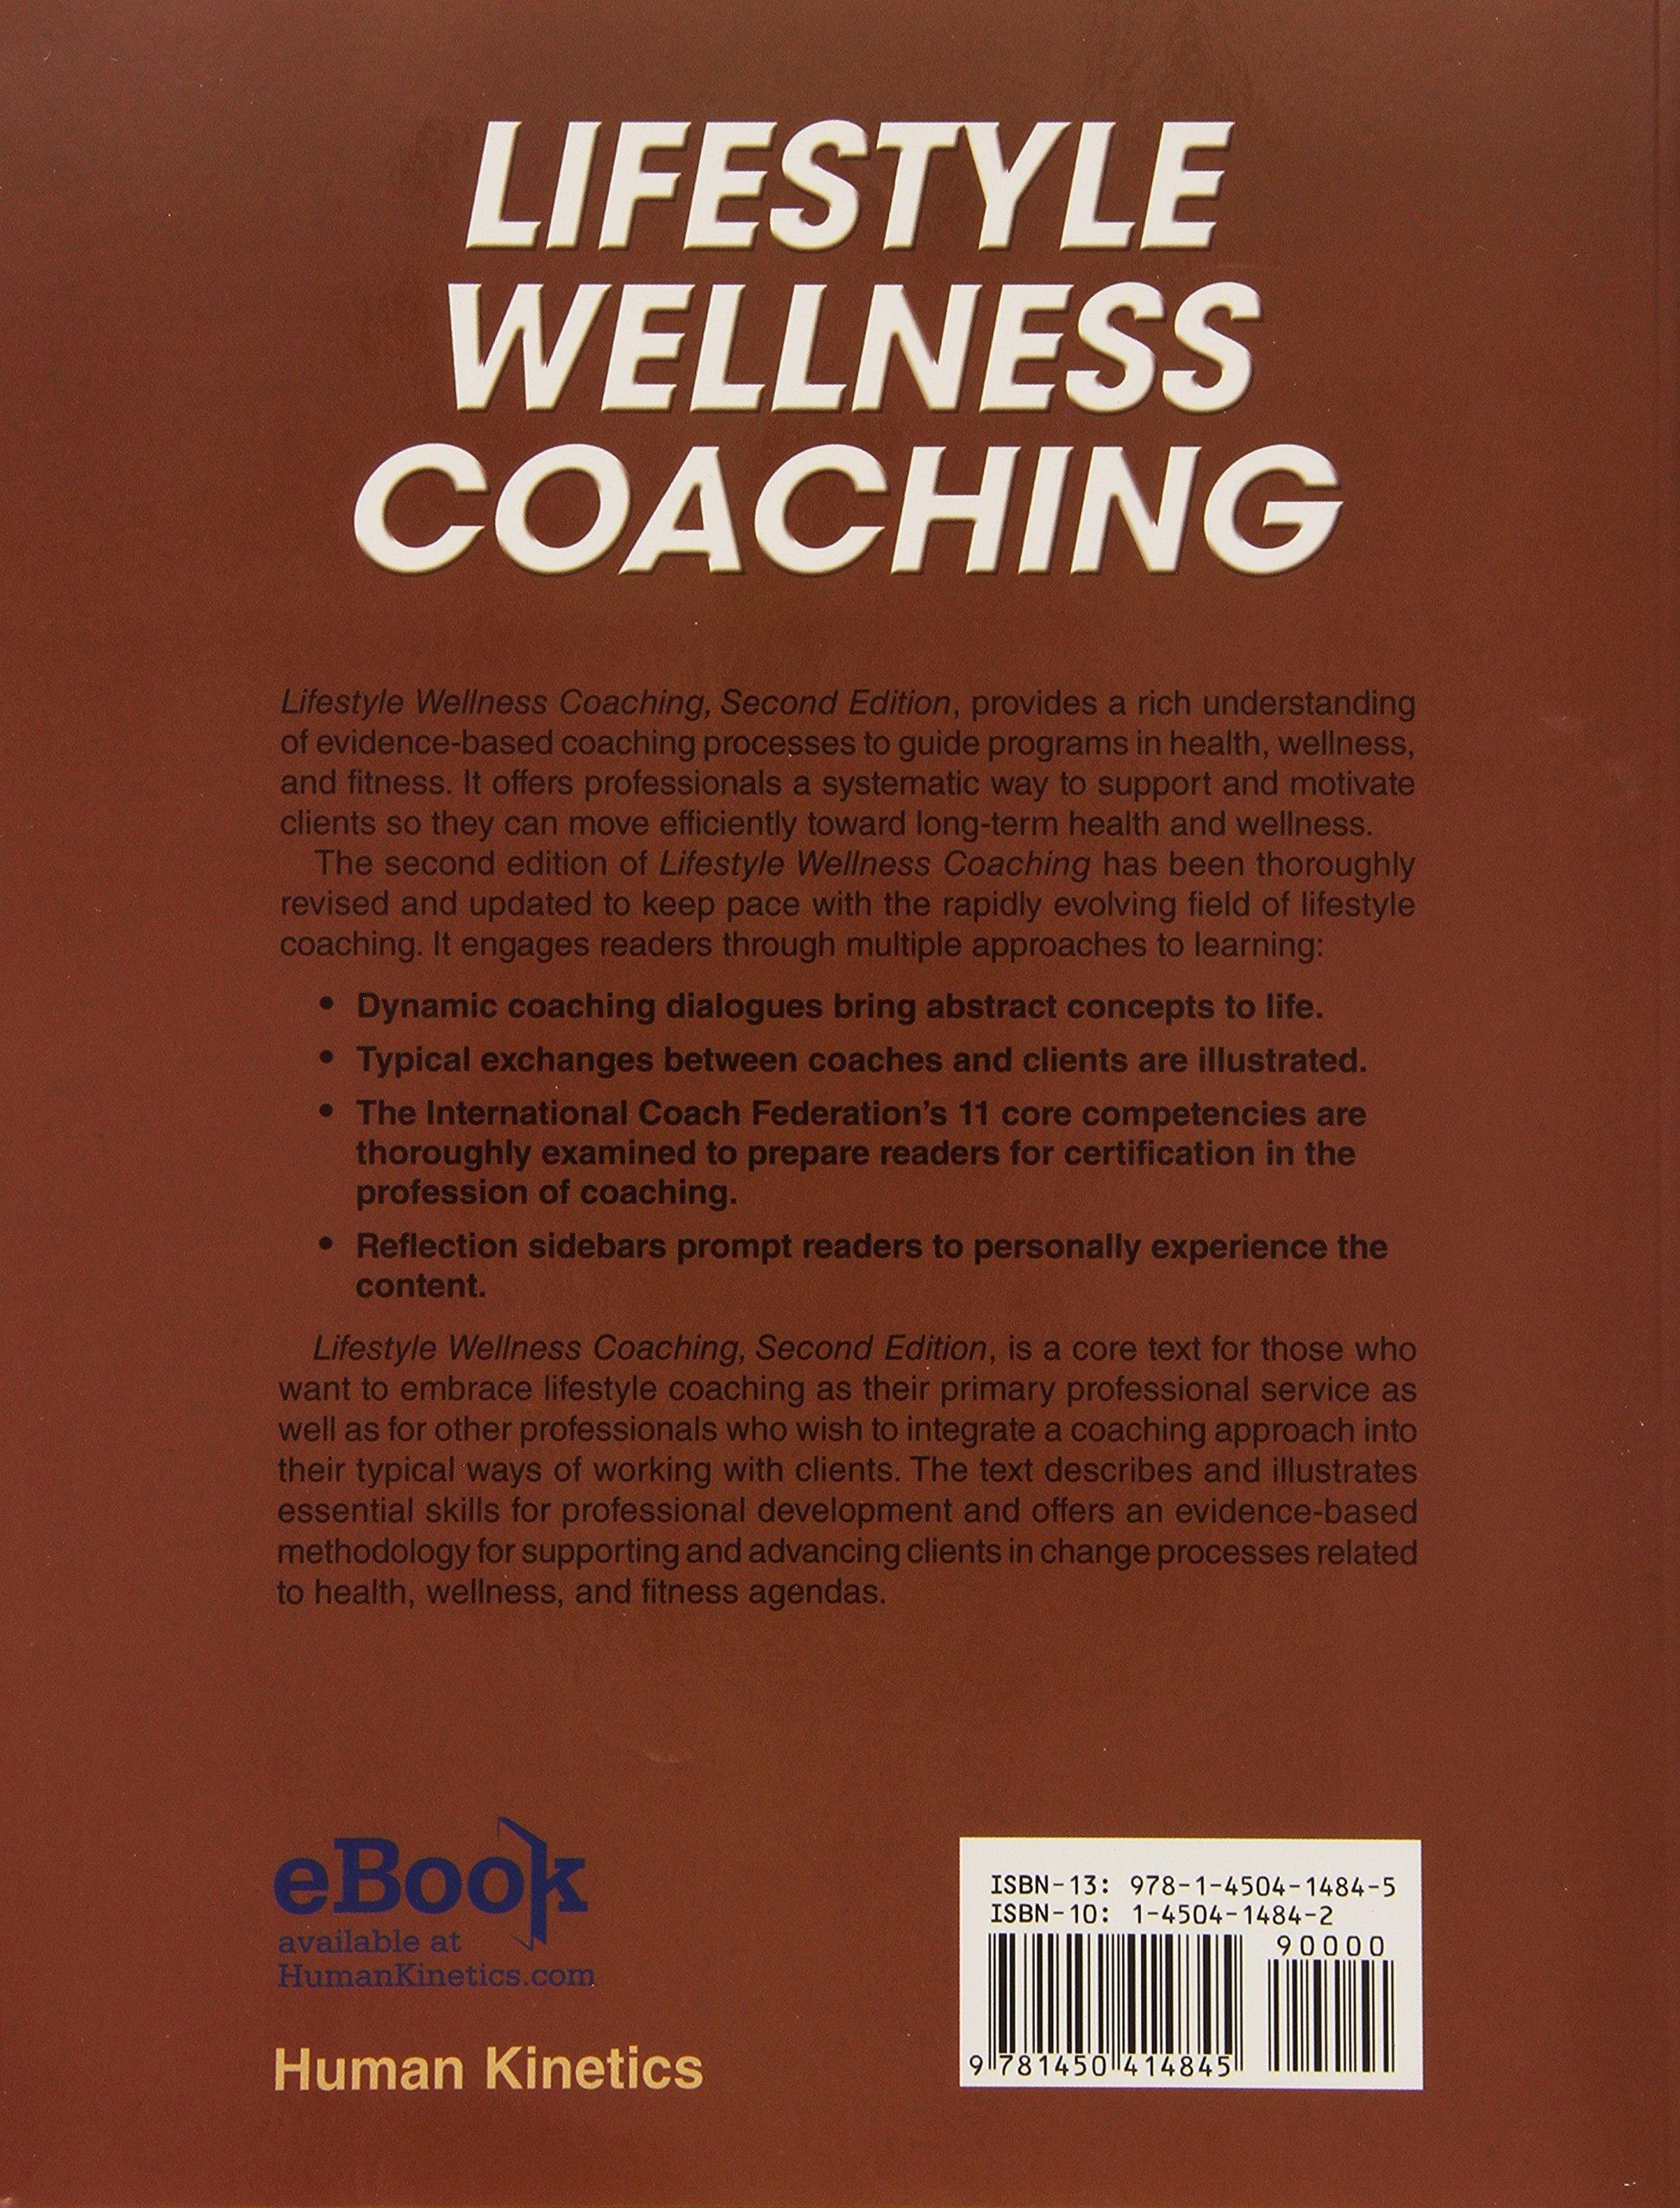 Lifestyle wellness coaching 2nd edition james gavin madeleine lifestyle wellness coaching 2nd edition james gavin madeleine mcbrearty 9781450414845 sports medicine amazon canada xflitez Image collections